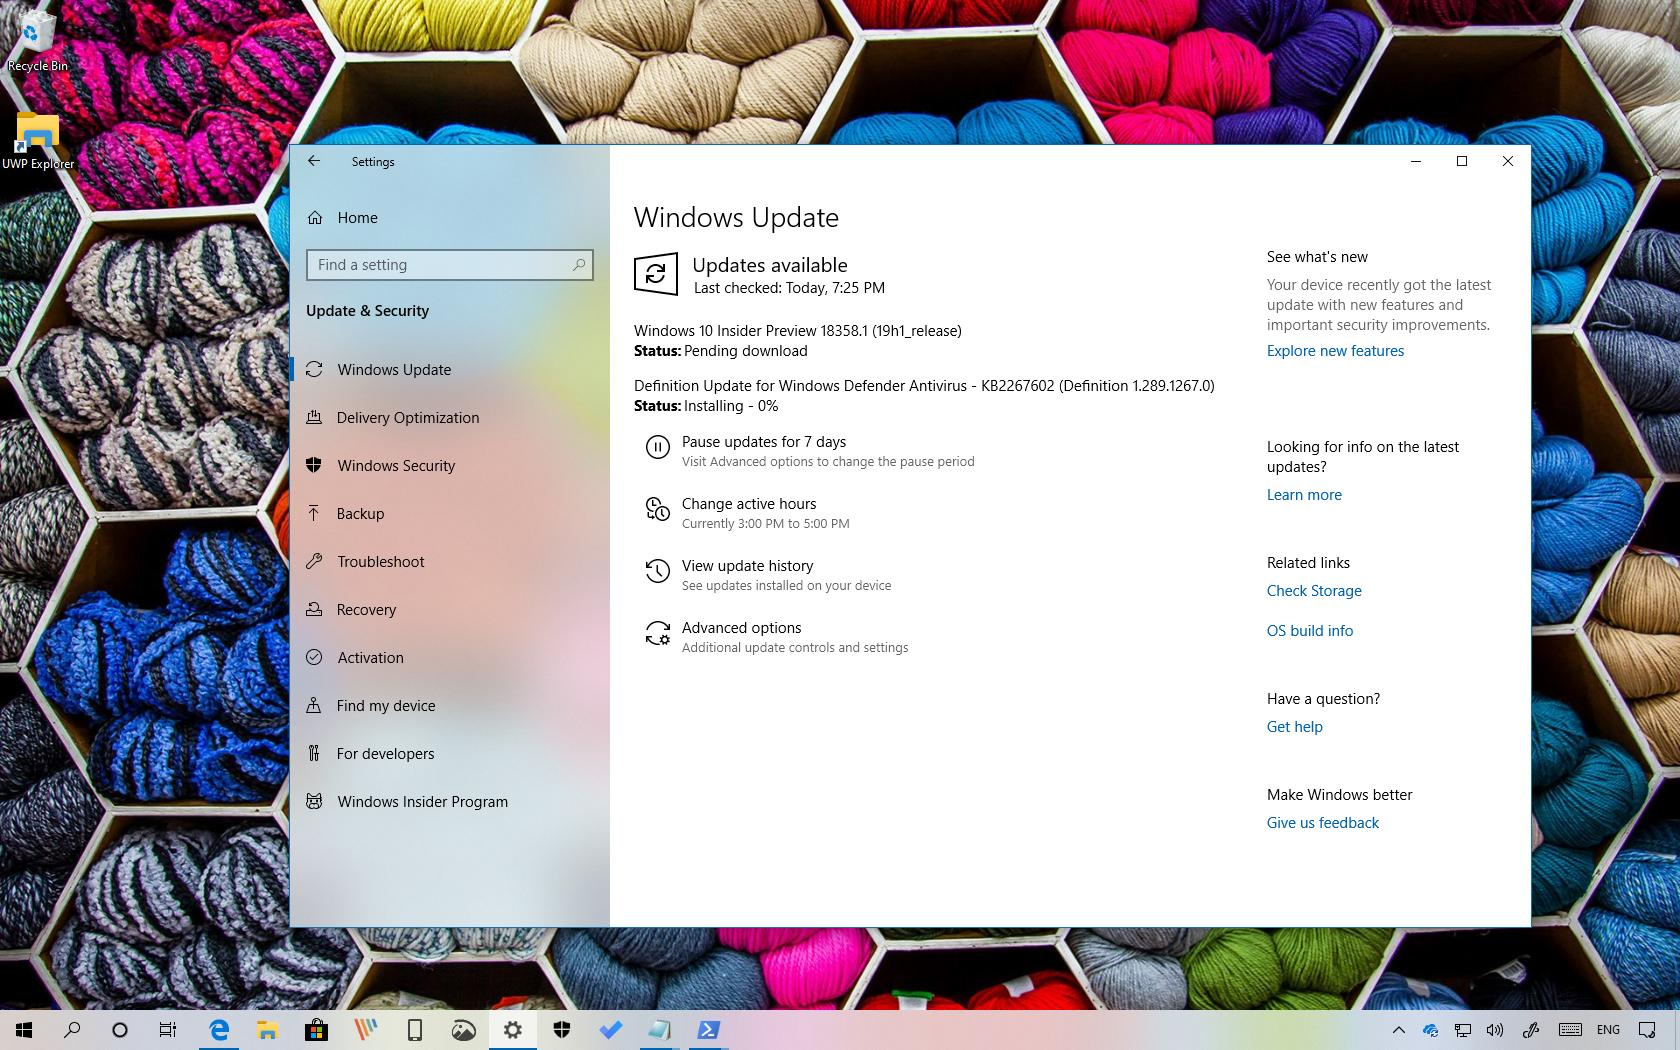 Windows 10 build 18358